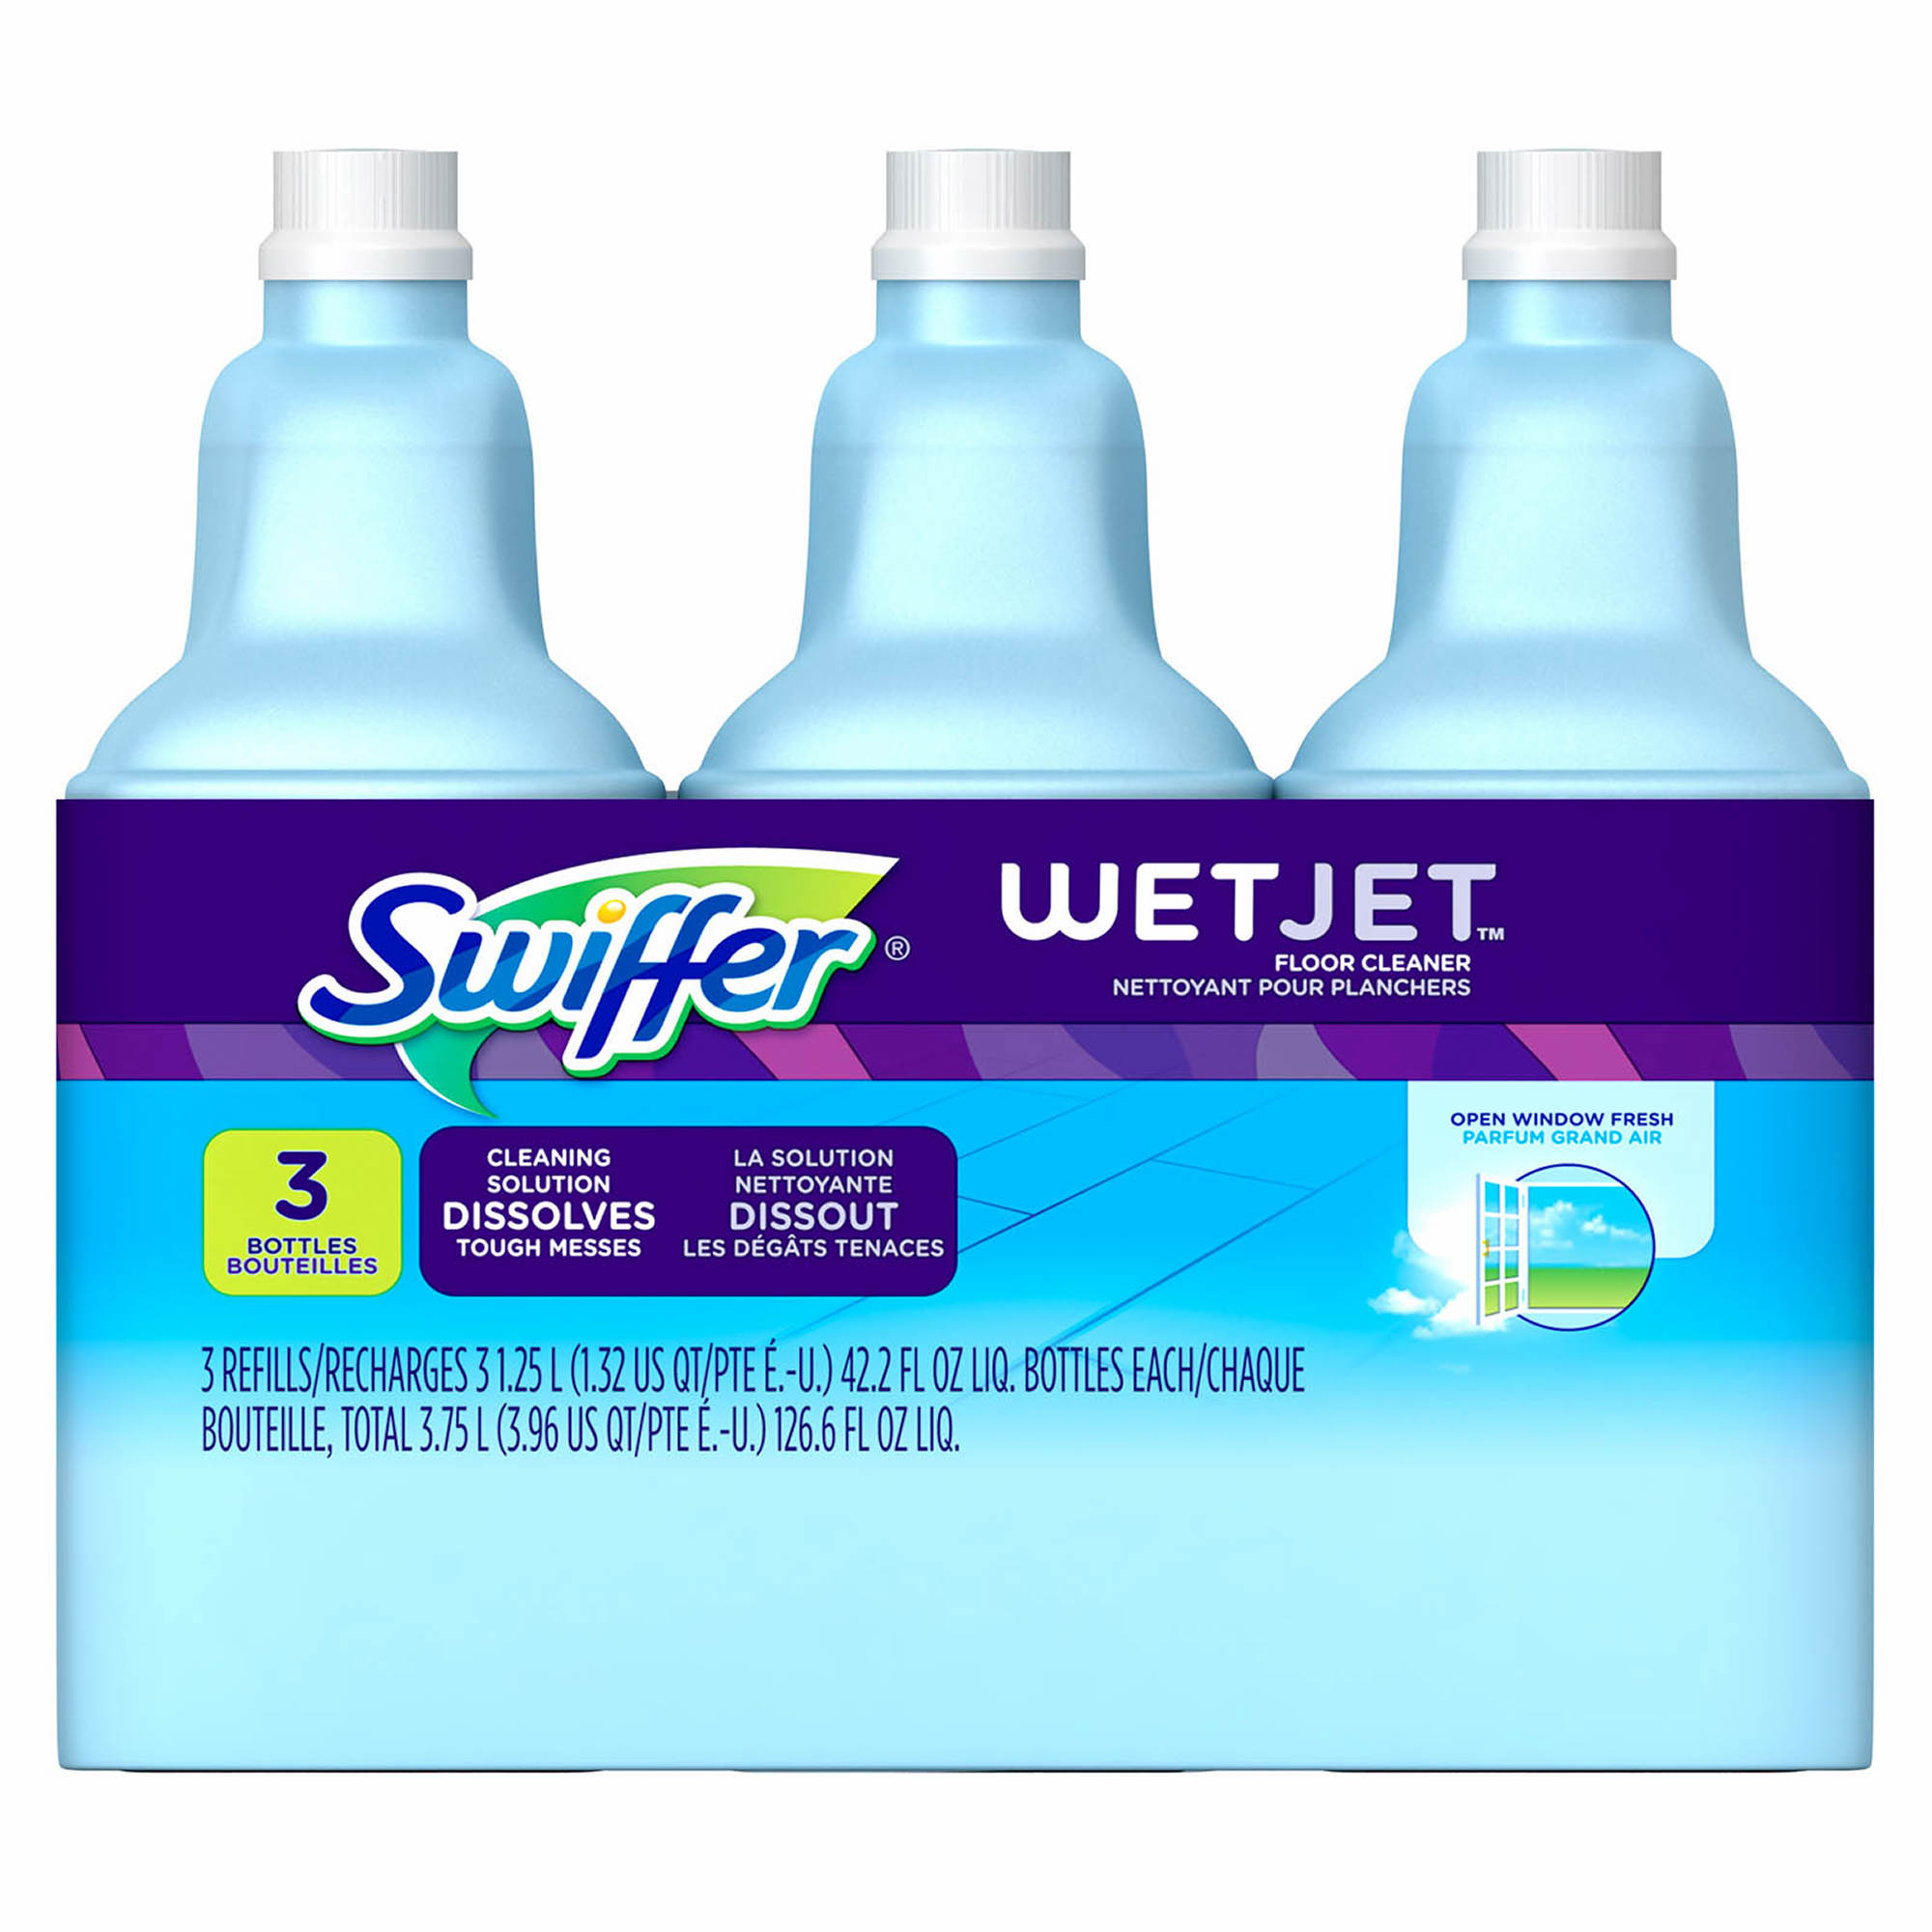 Swiffer WetJet Multi-Purpose Cleaner Solution Refill, Open Window Fresh Scent, 1.25L., 3 pk.